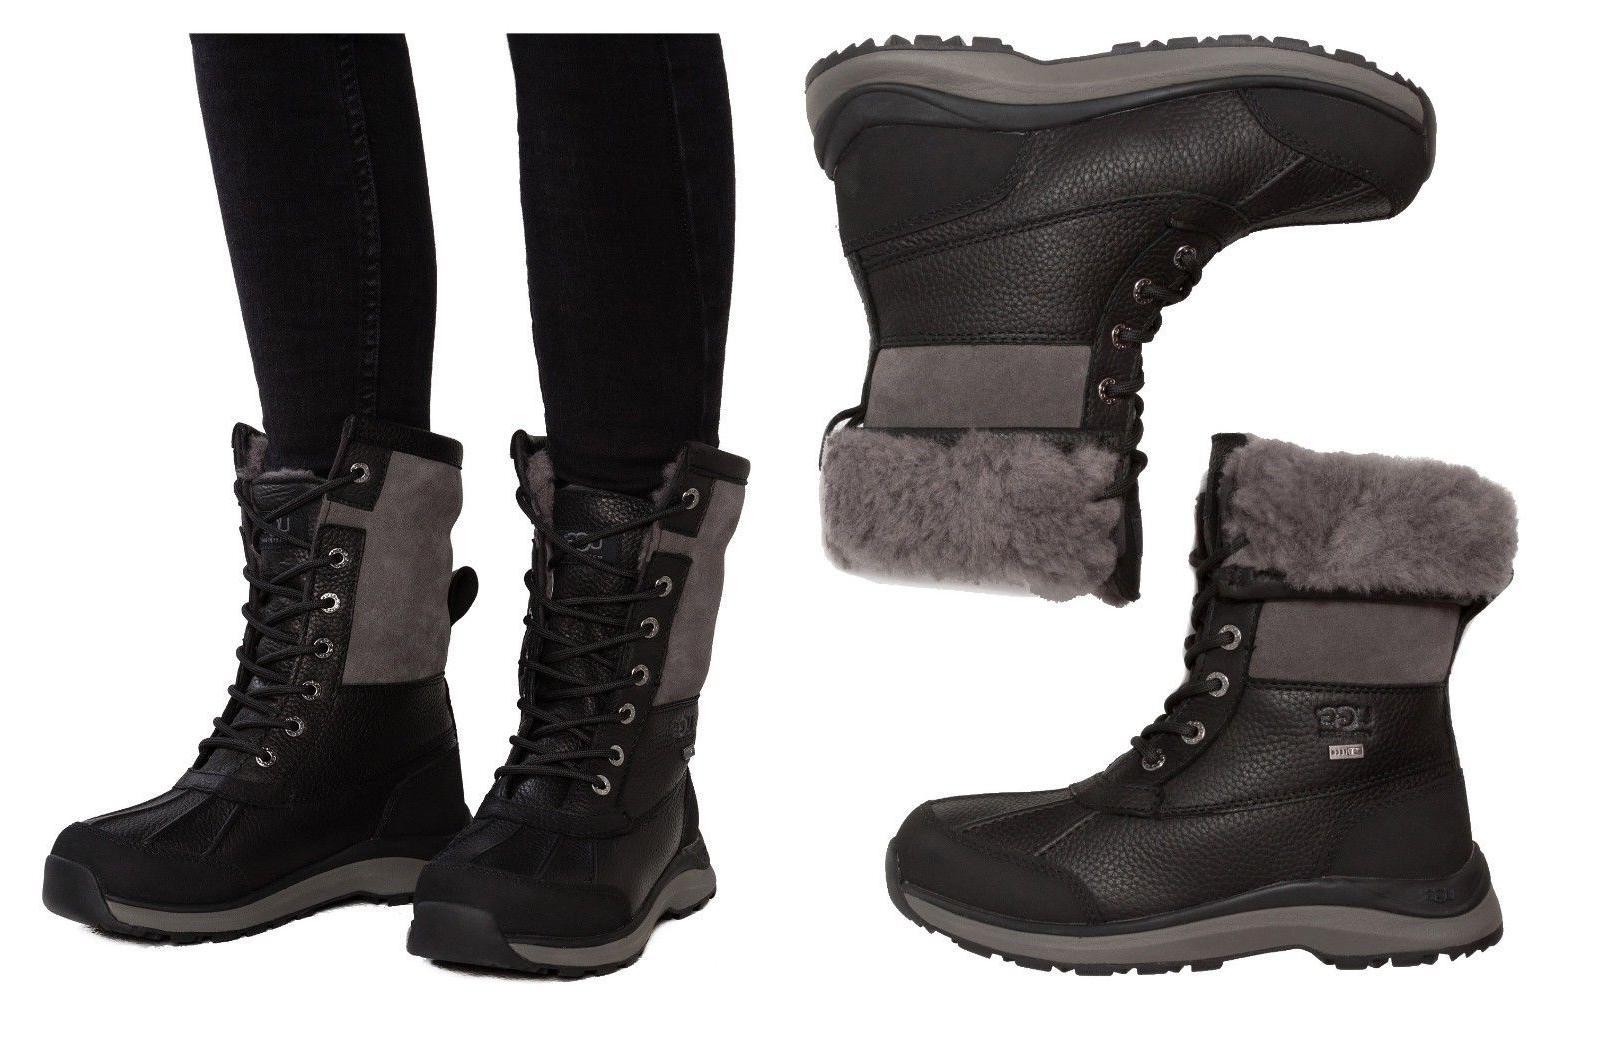 authentic brand women s shoes waterproof adirondack